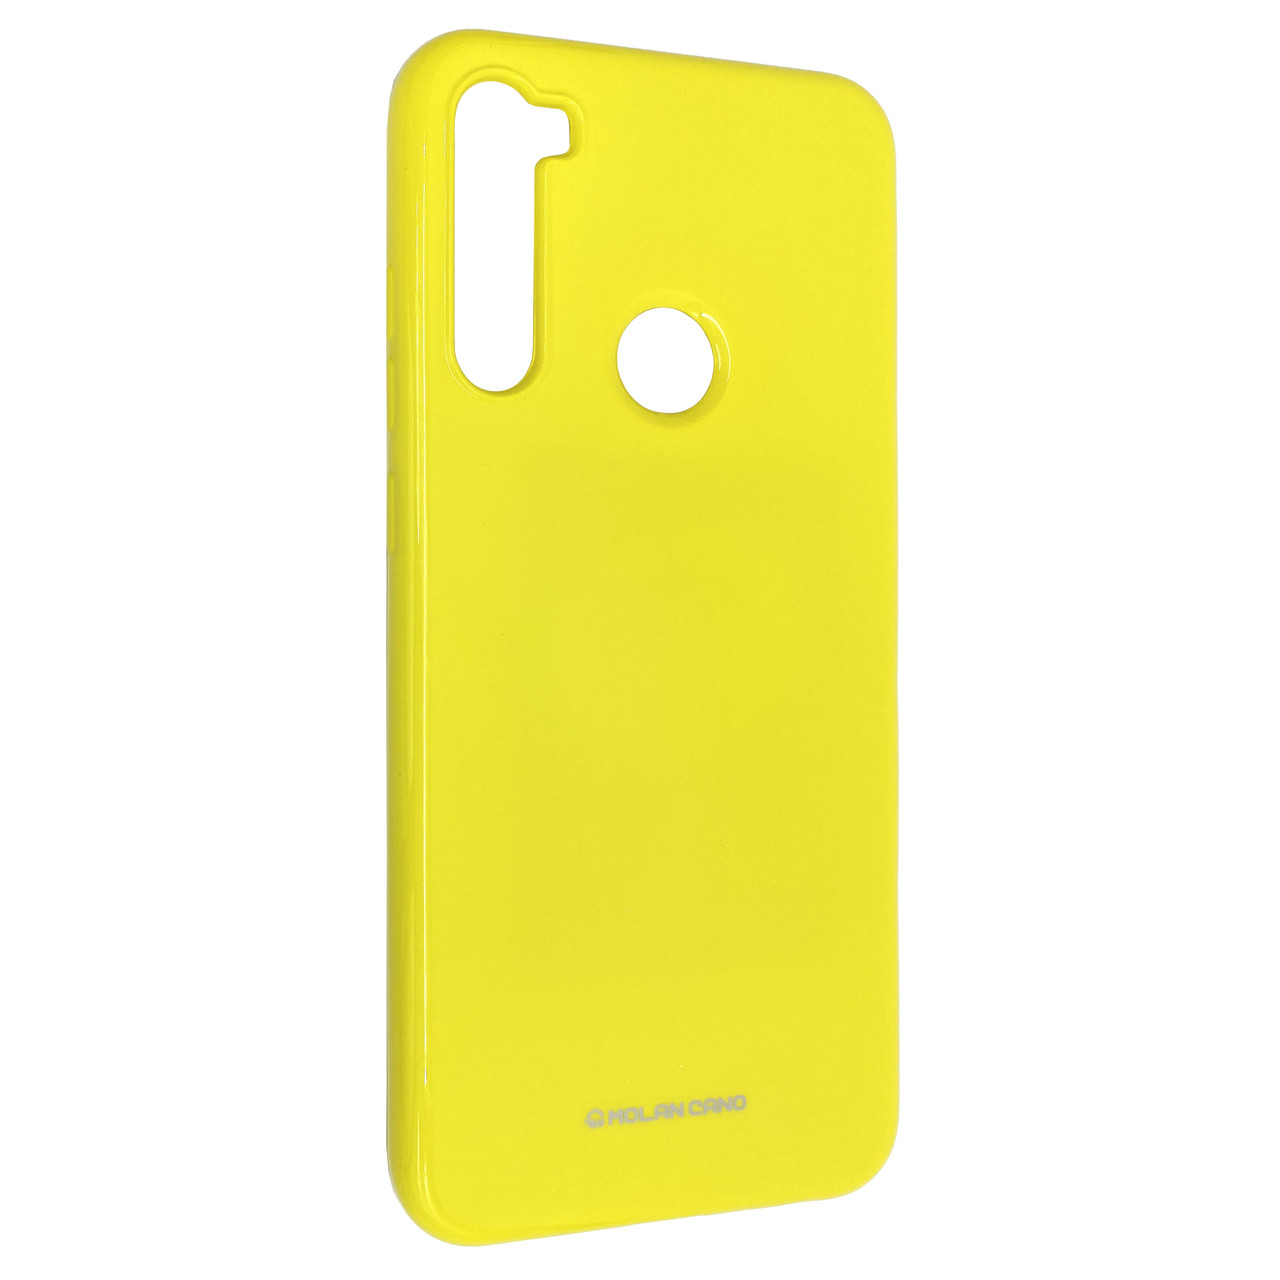 Чехол-накладка Silicone Molan Cano Jelly Case для Xiaomi Redmi Note 8T (yellow)